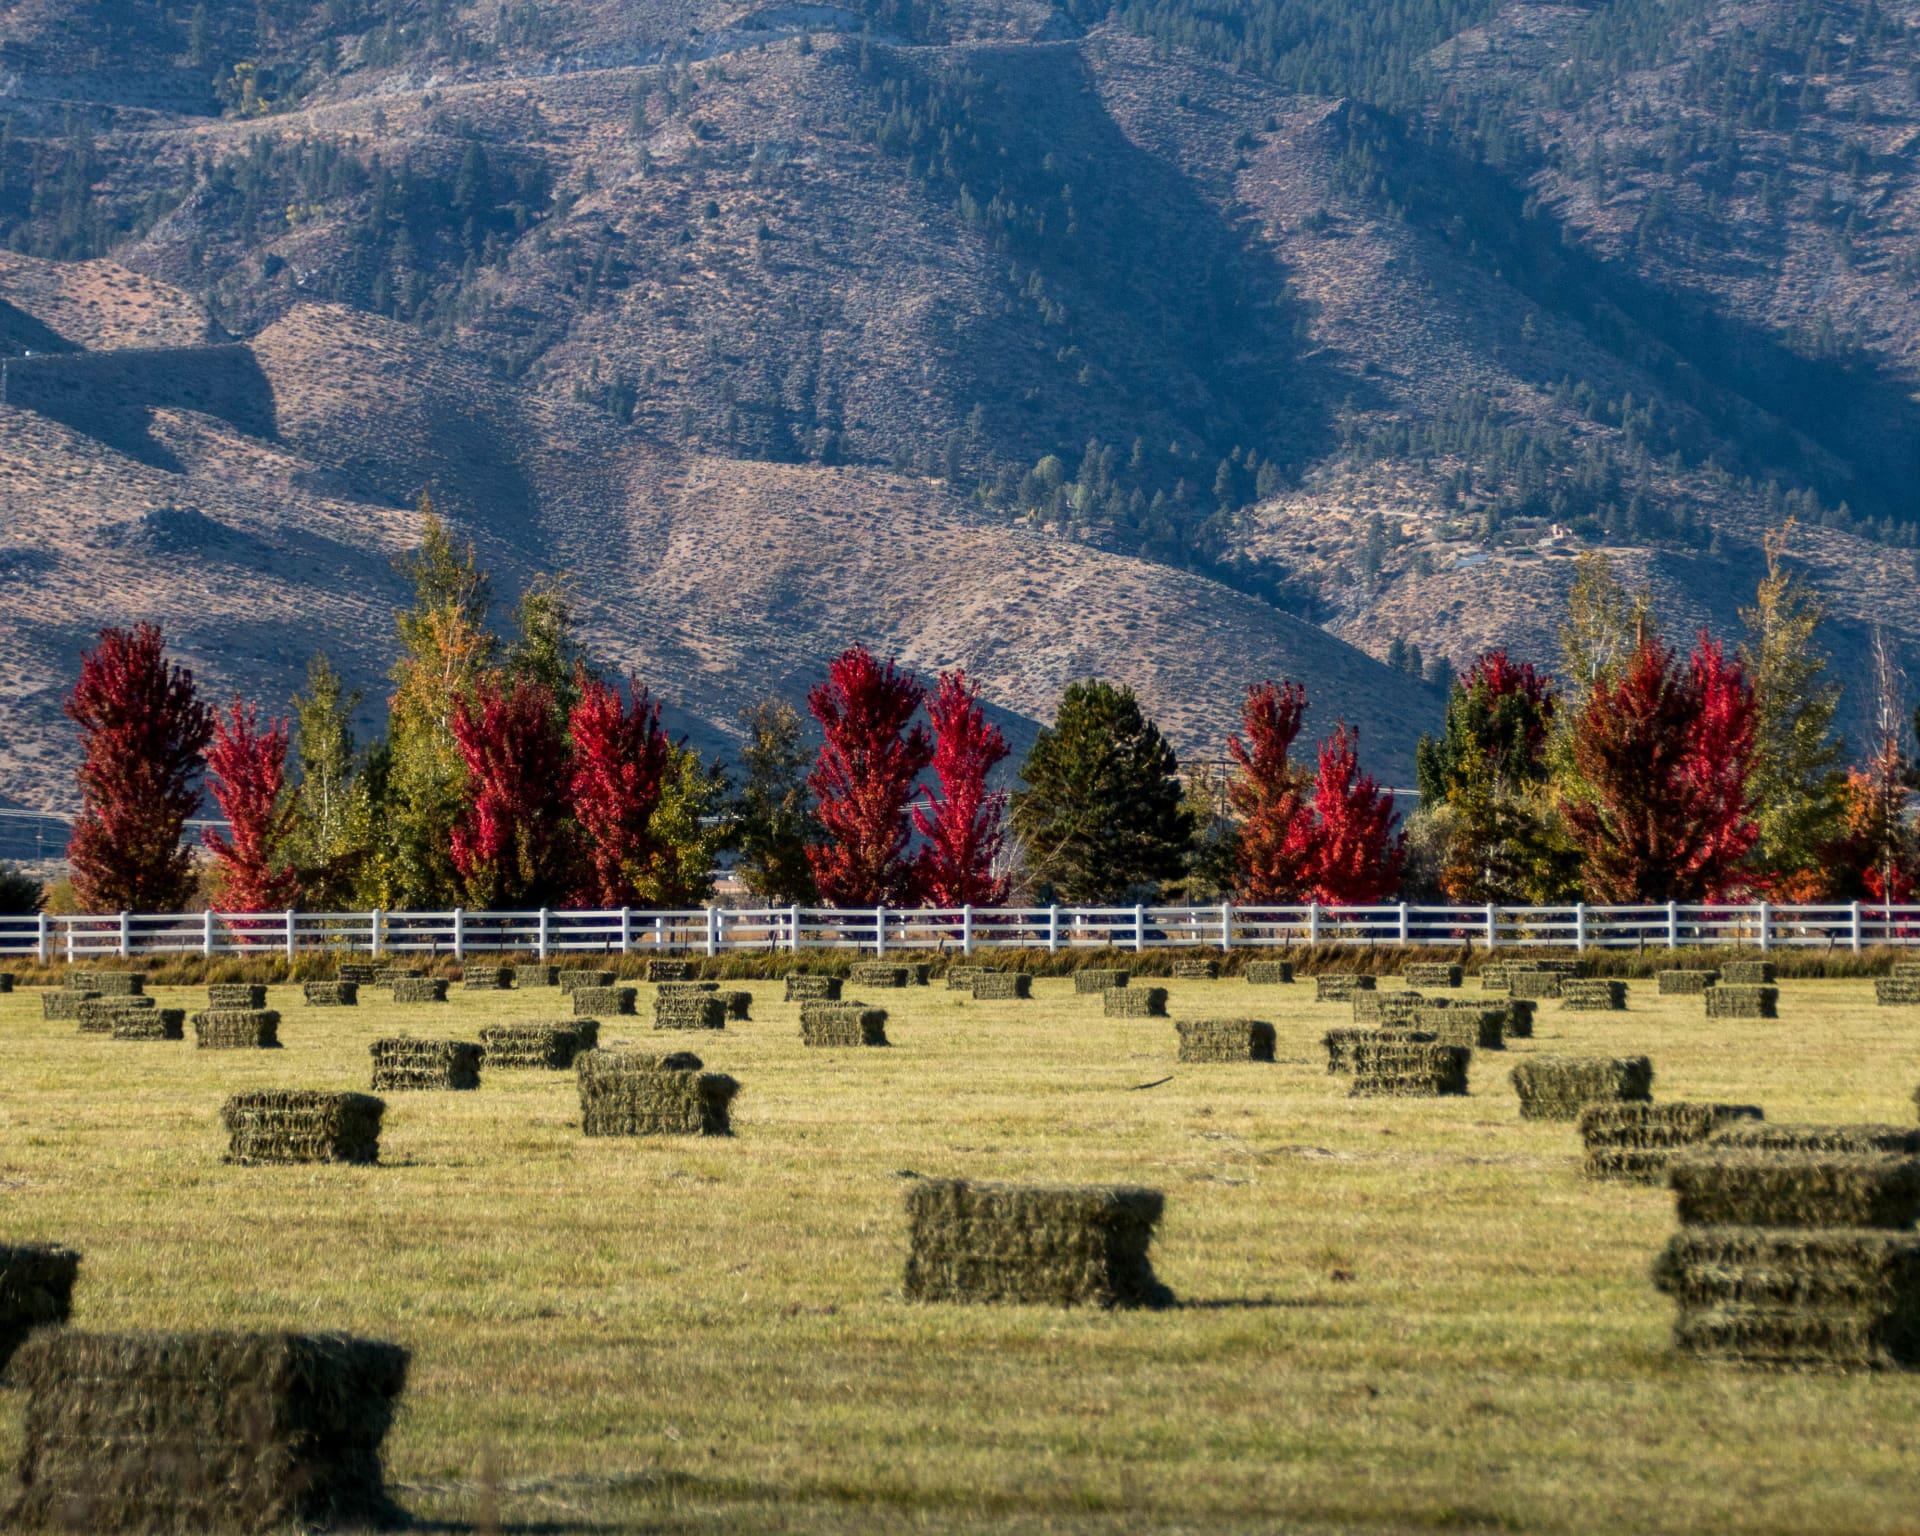 9-30-17-Fall-Hay-Field---Gardnerville-NV-w1920.jpg